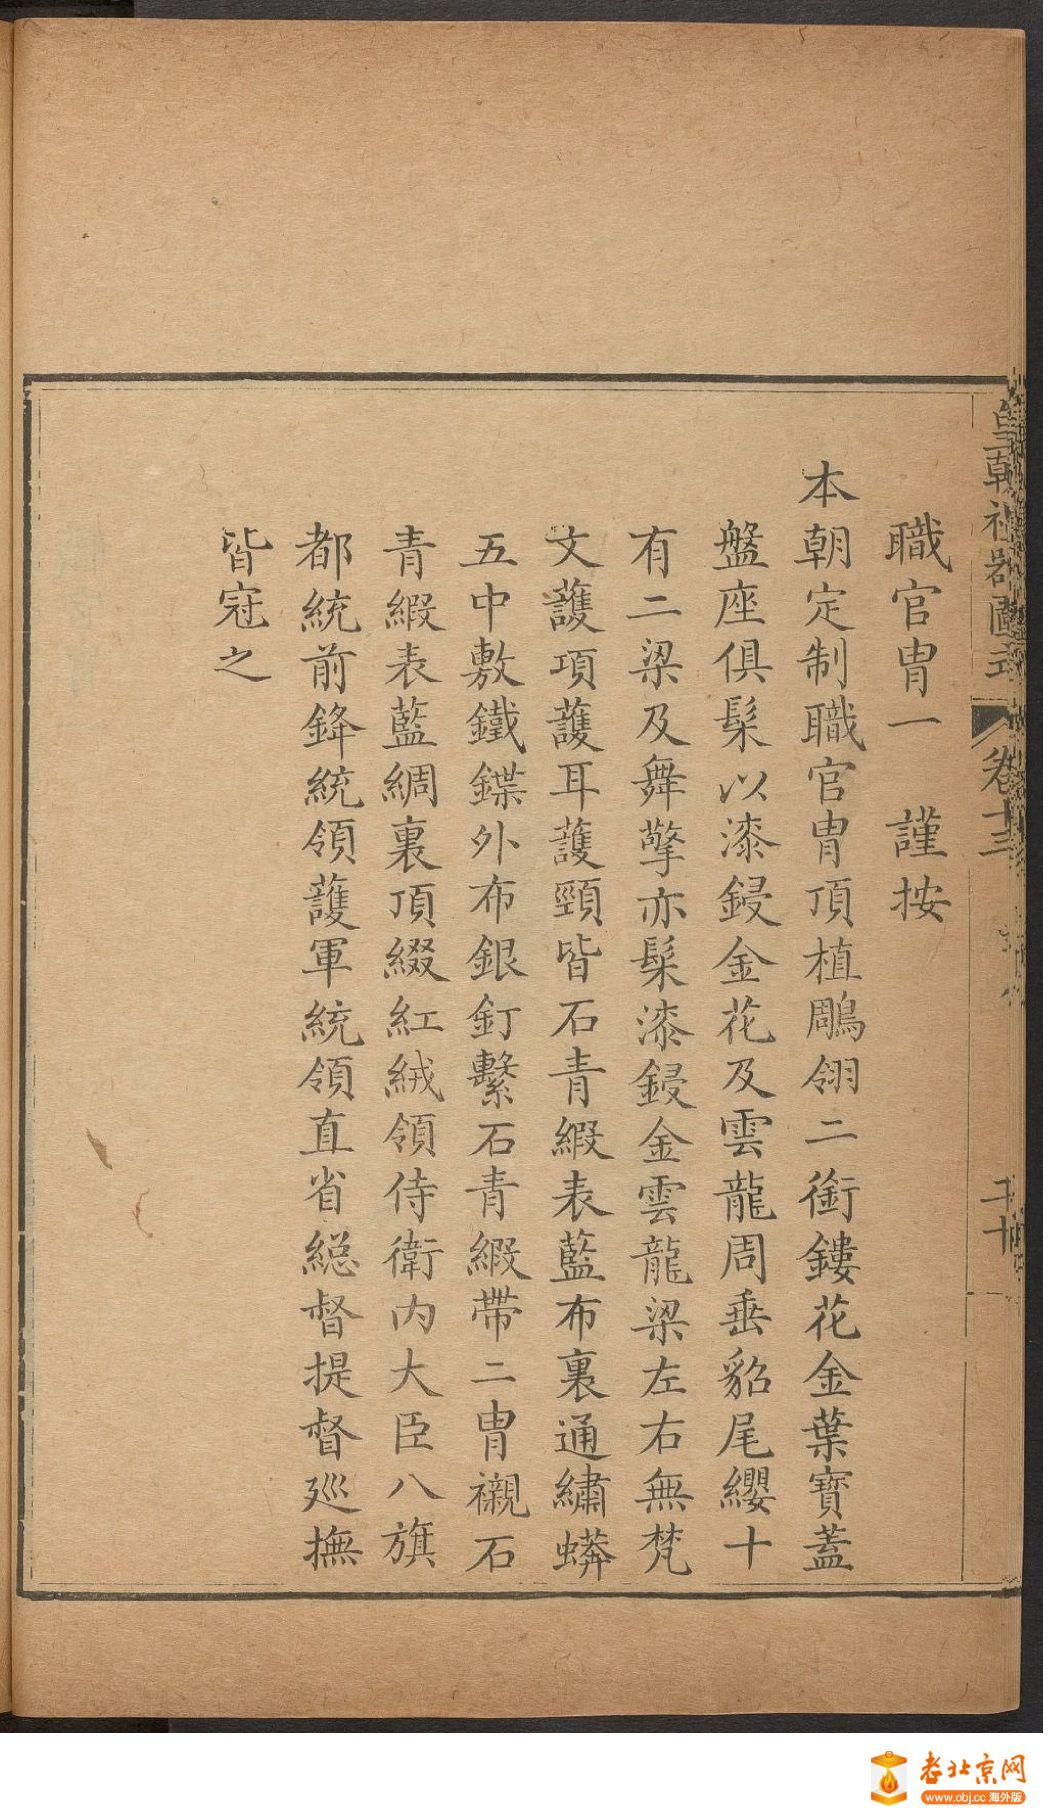 3_page1_image1b.jpg